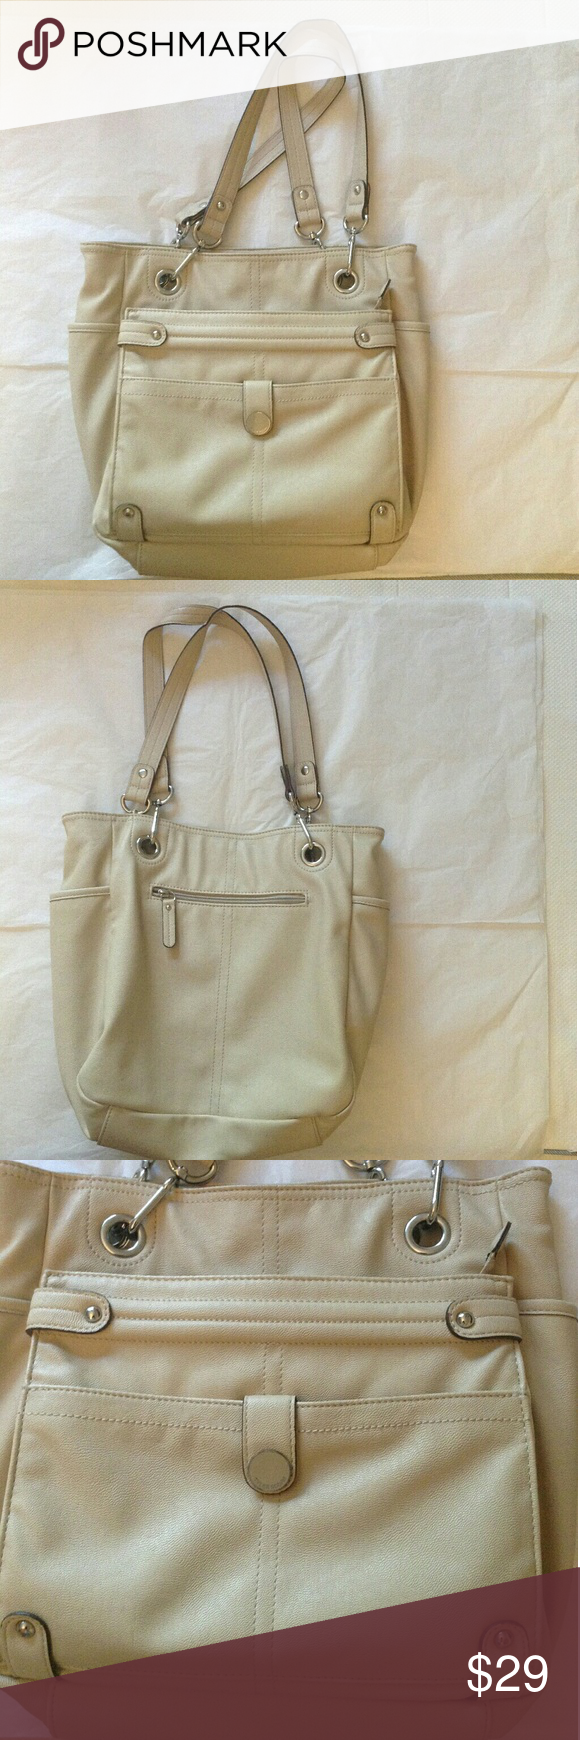 Tyler Rodan Bag Excellent Condition Bags Shoulder